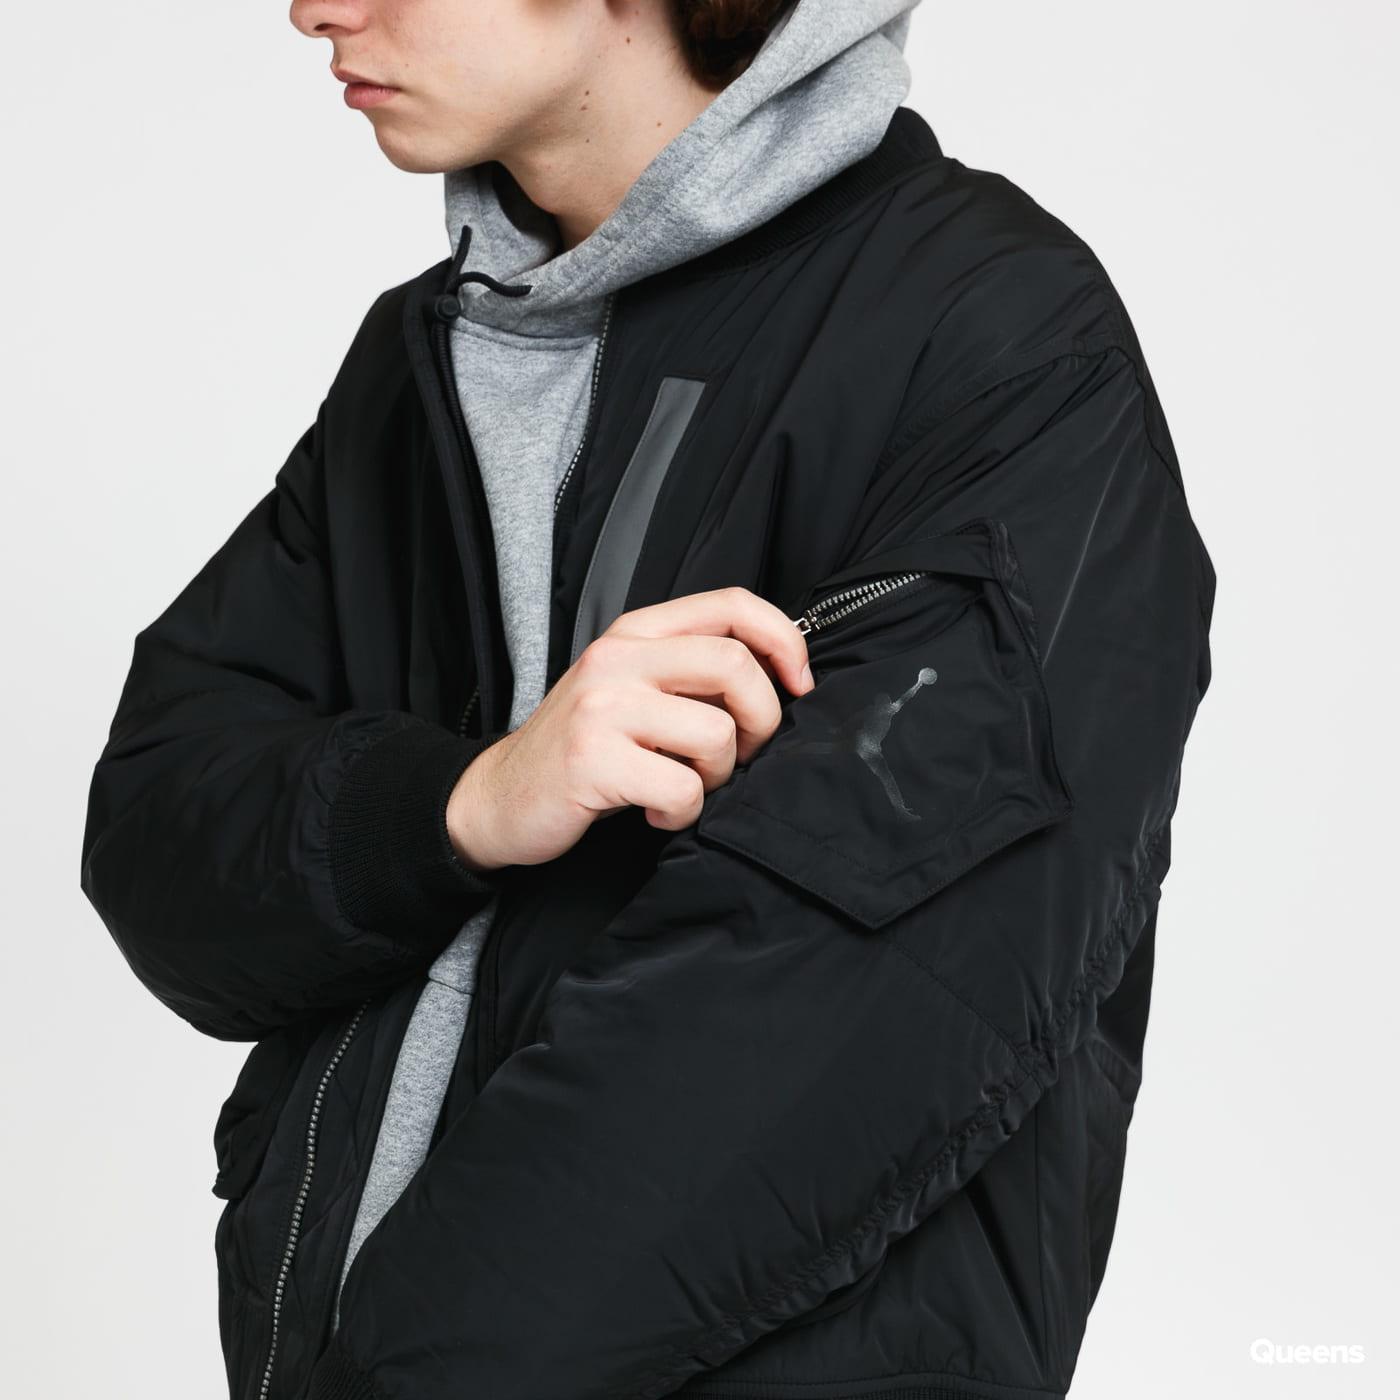 Jordan M J MA - 1 Jacket black